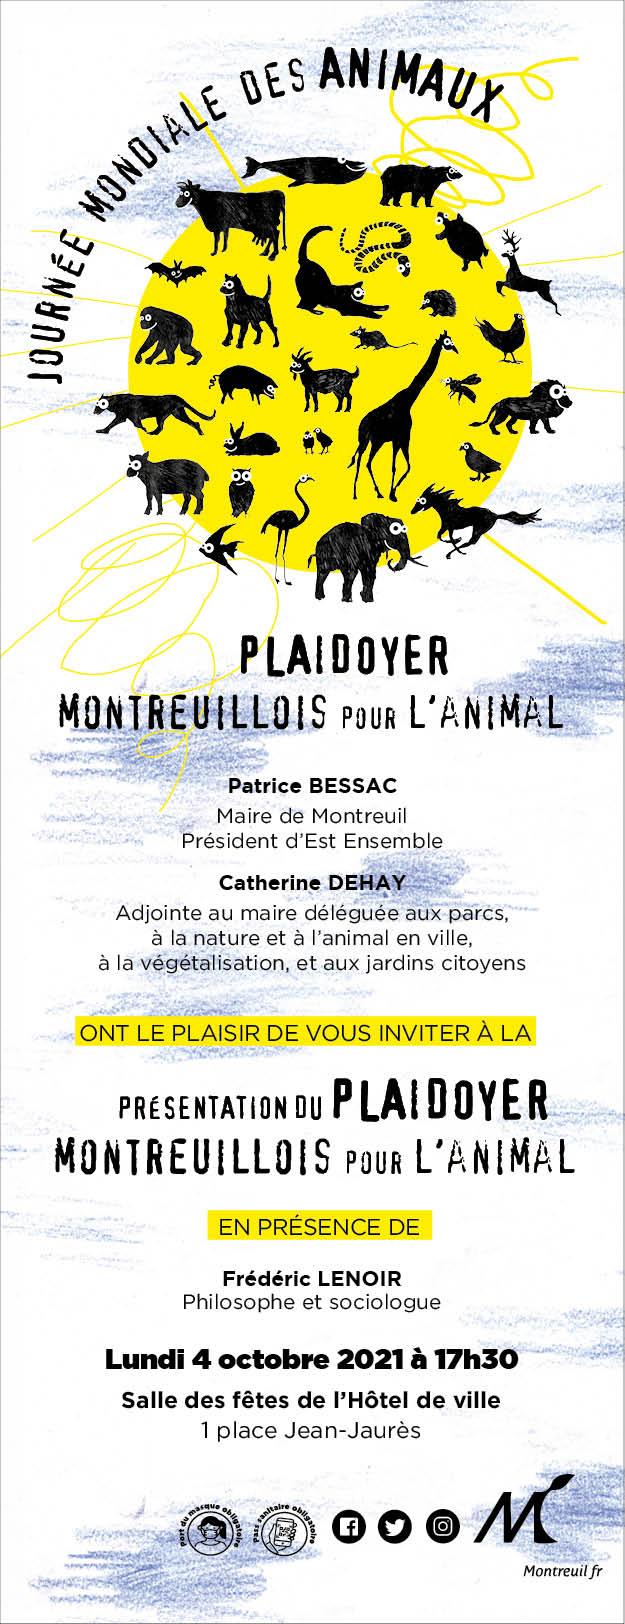 Affiche Montreuil plaidoyer animal 2021